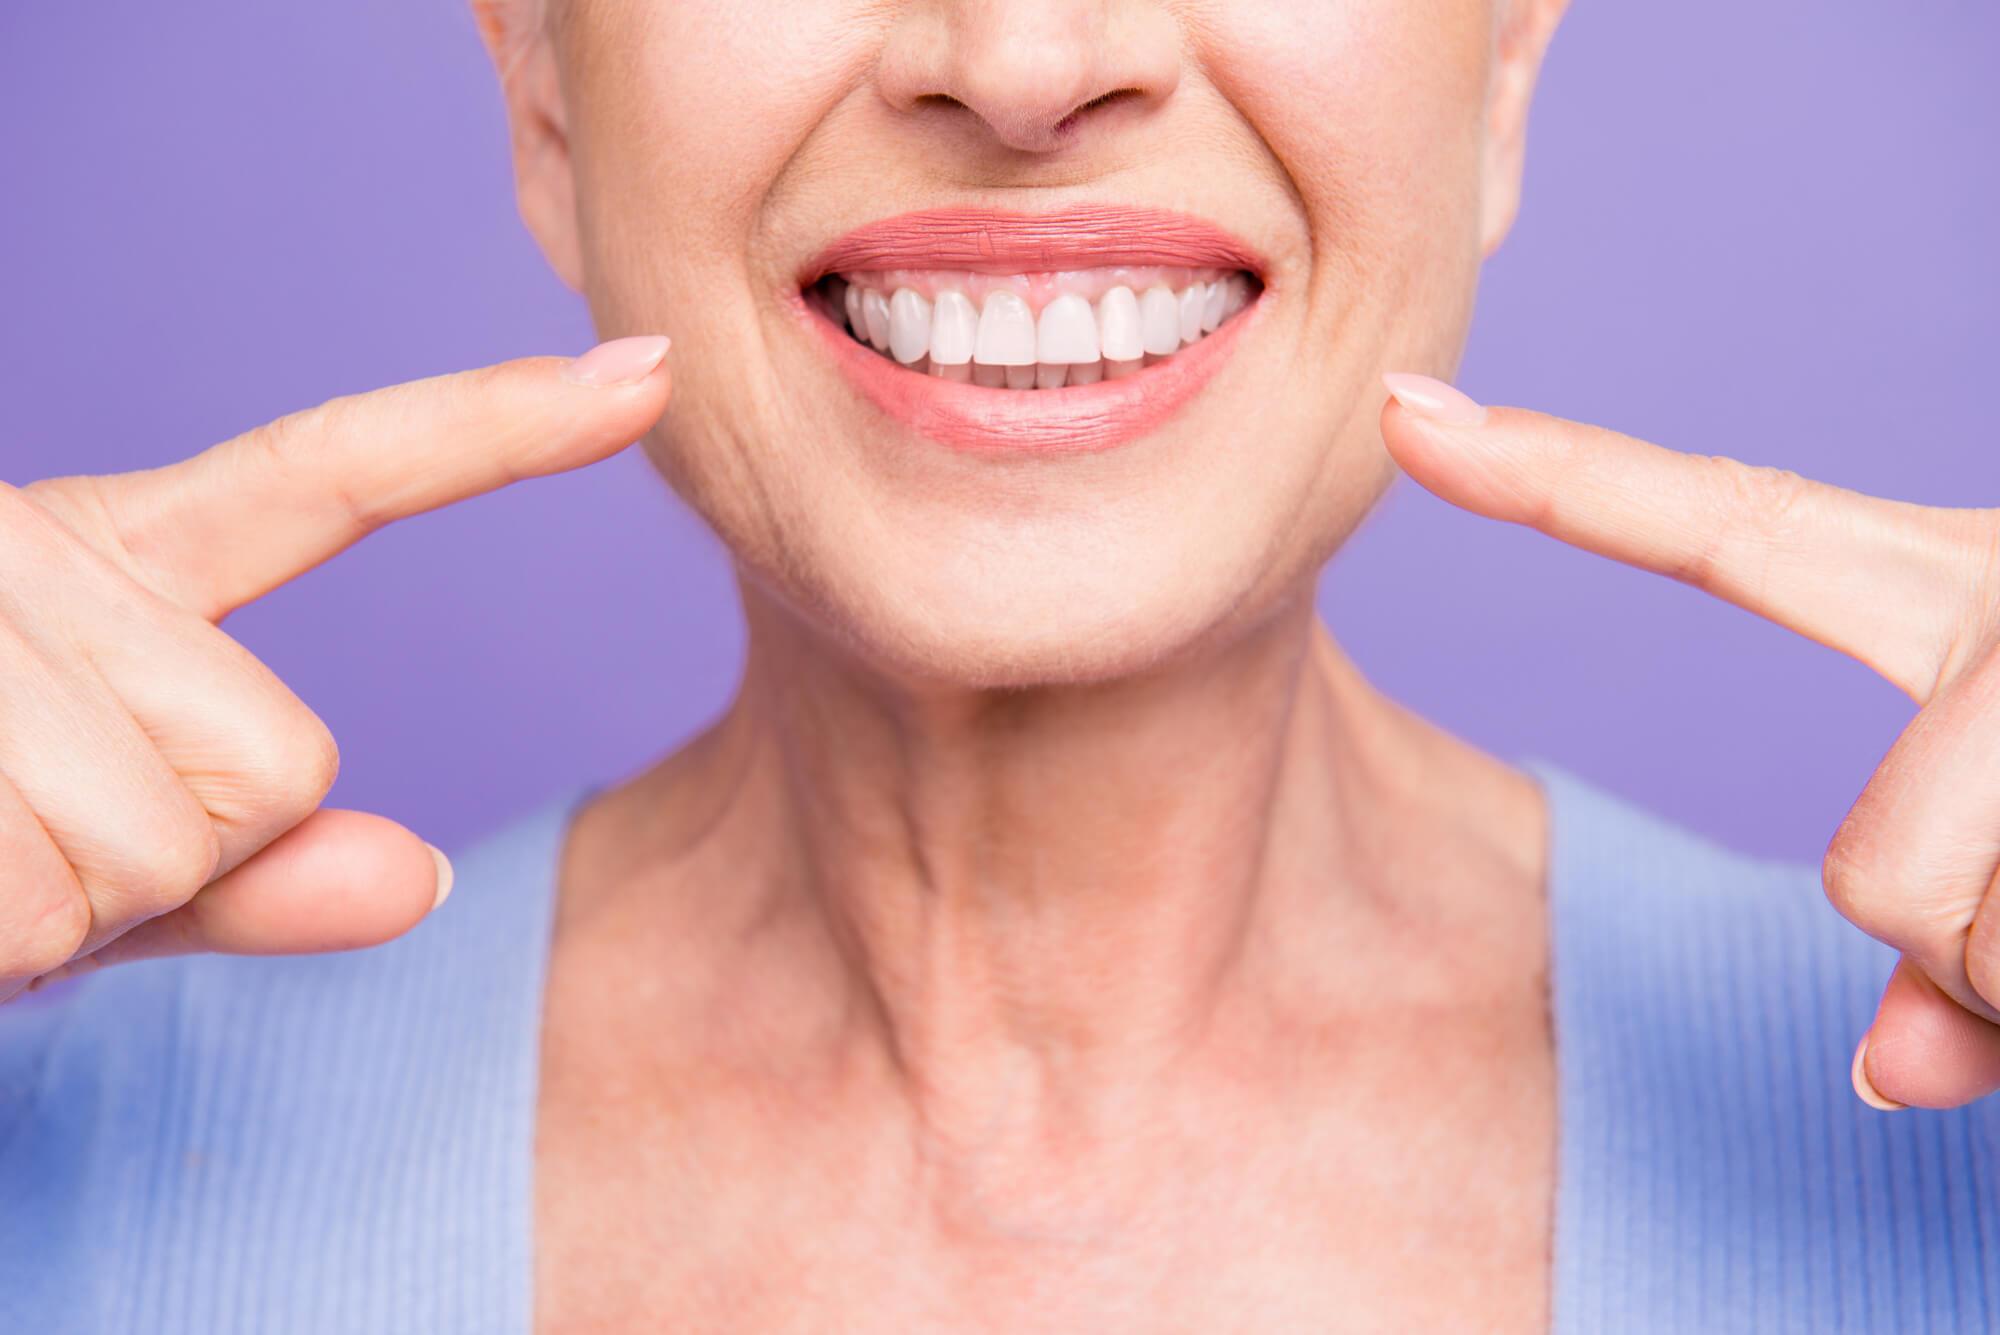 Differences Between Titanium and Ceramic Dental Implants